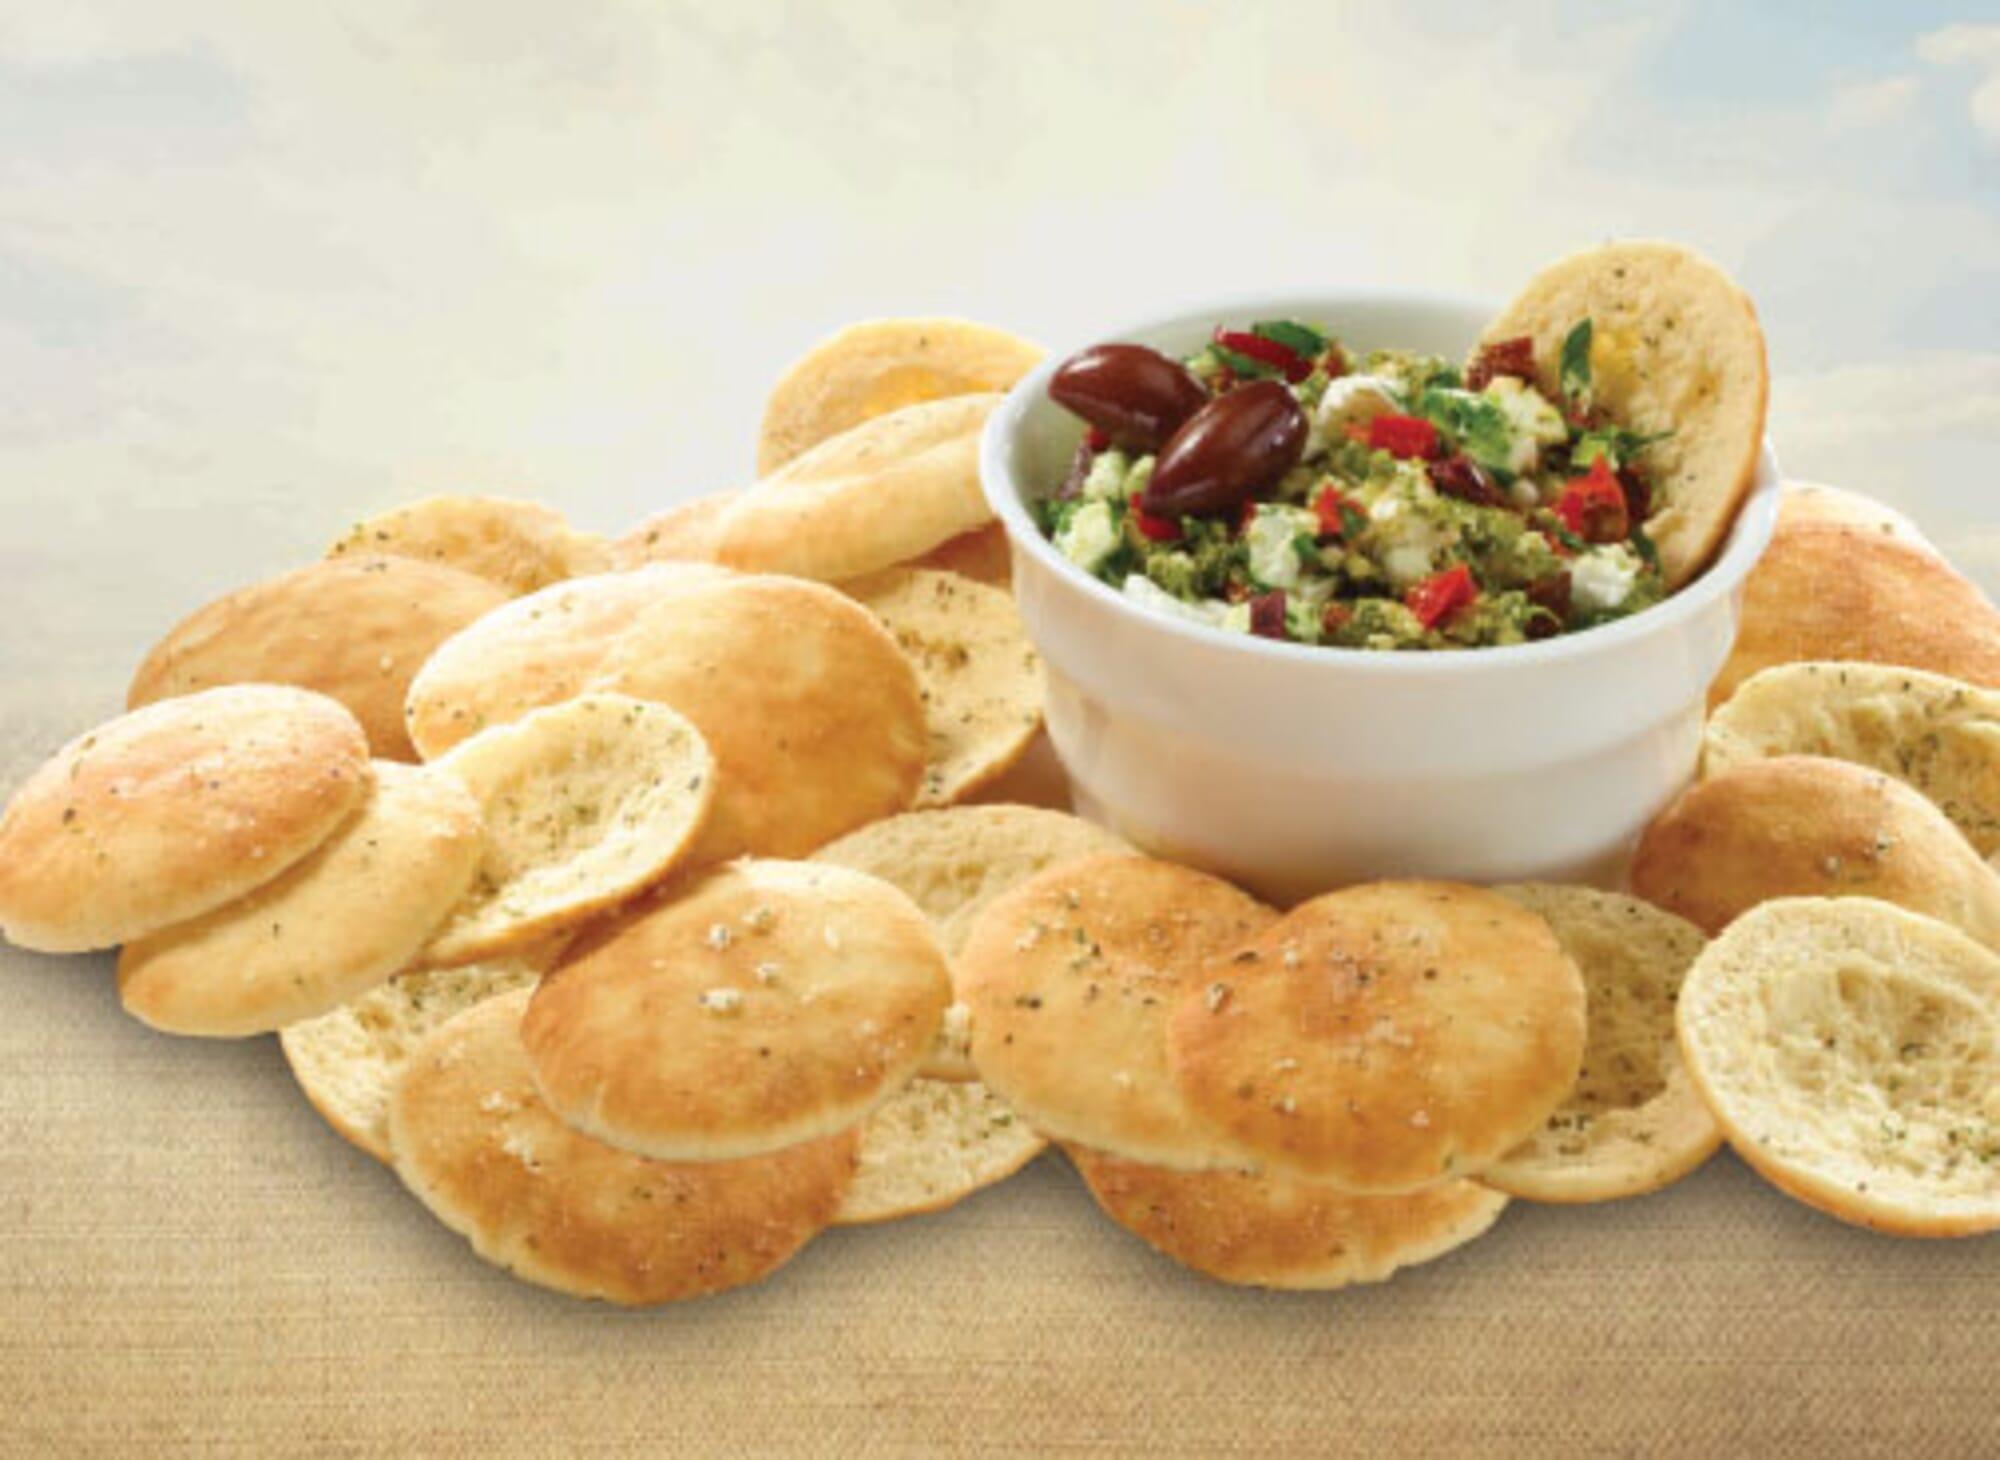 Toufayan Bakeries Pita Chip Feta and Olive Dip